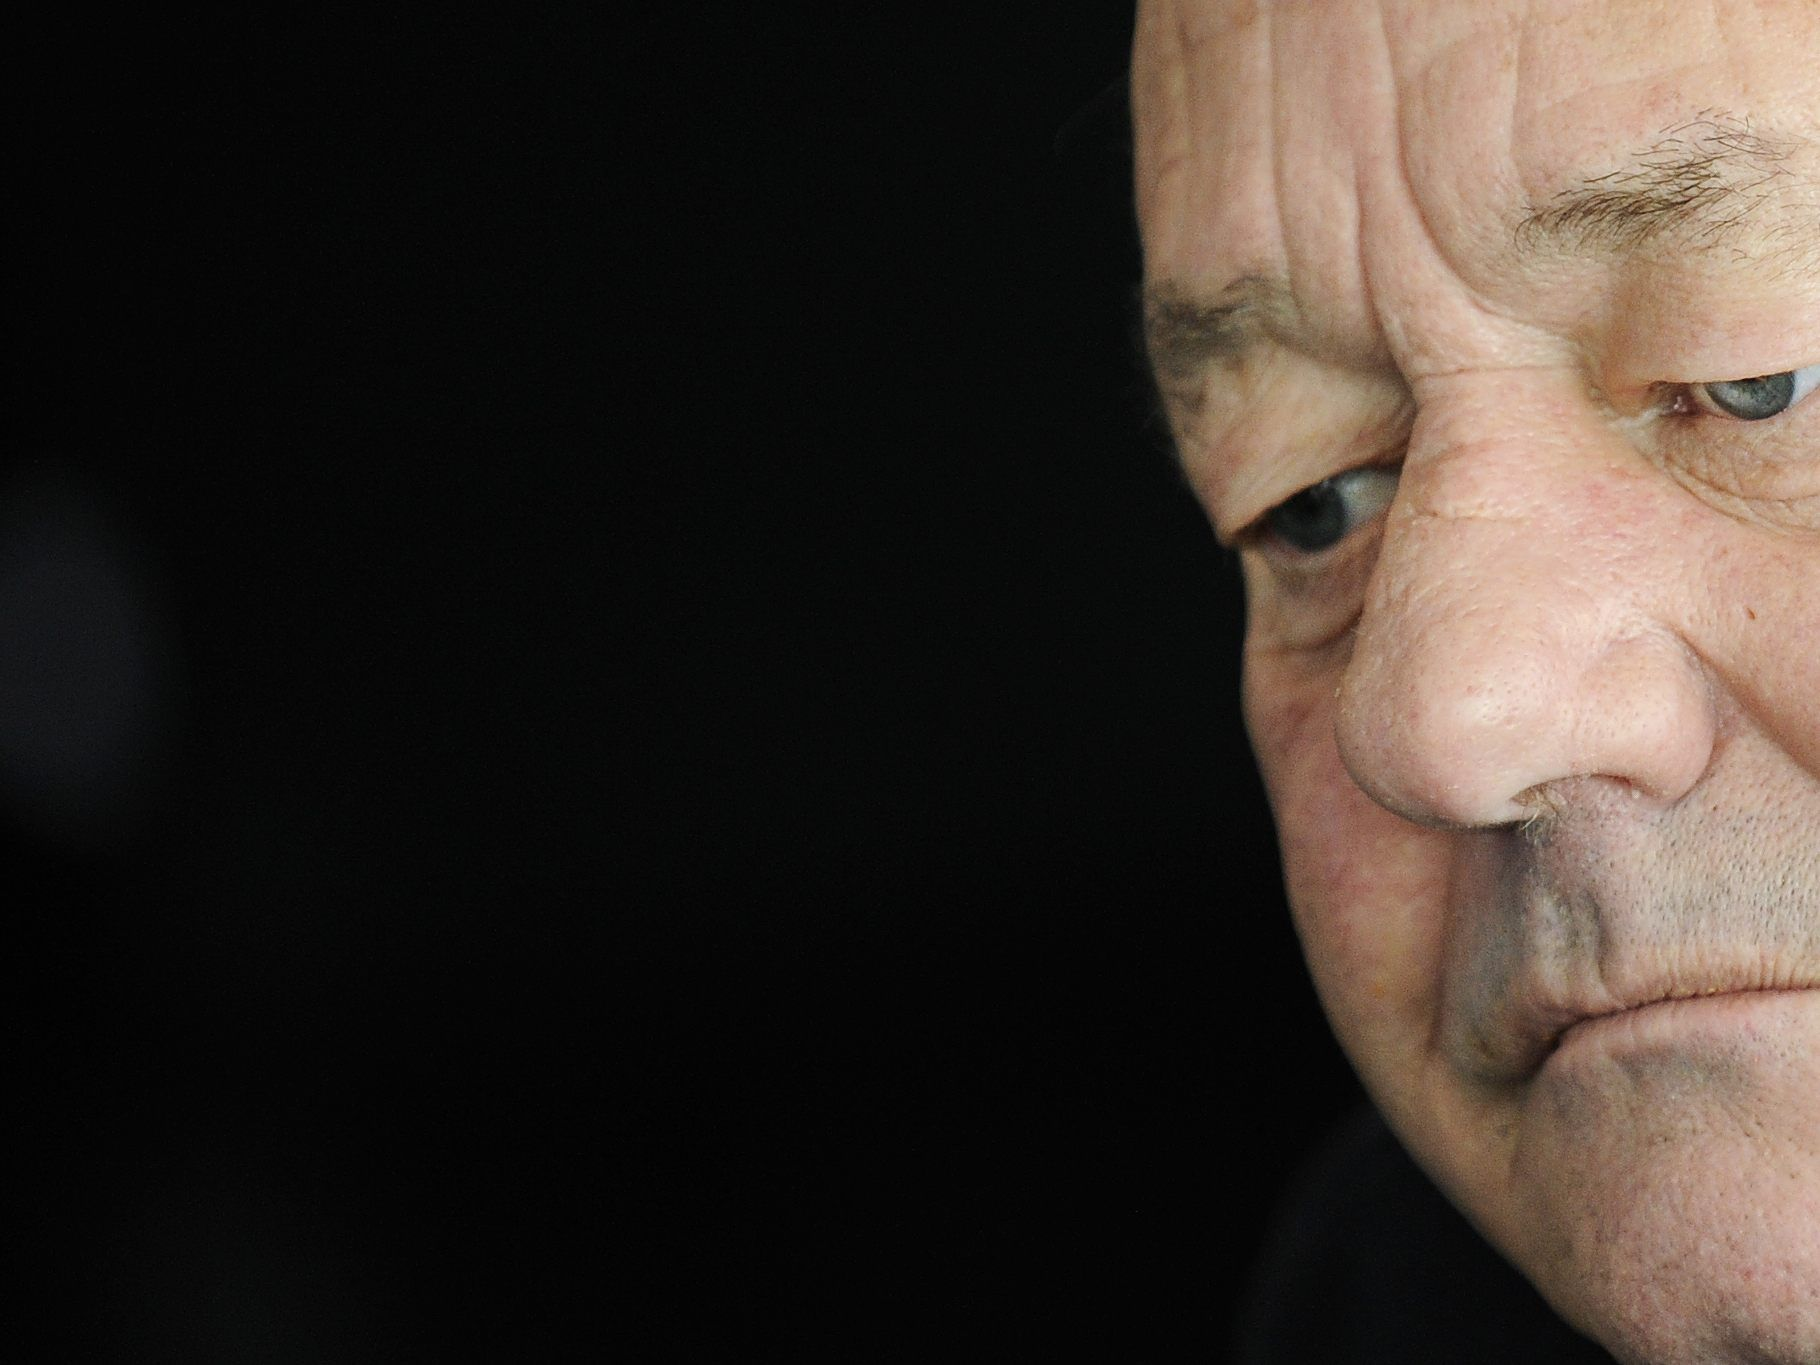 FPÖ-Generalsekretär attackiert Wolfgang Ambros und Rainhard Fendrich